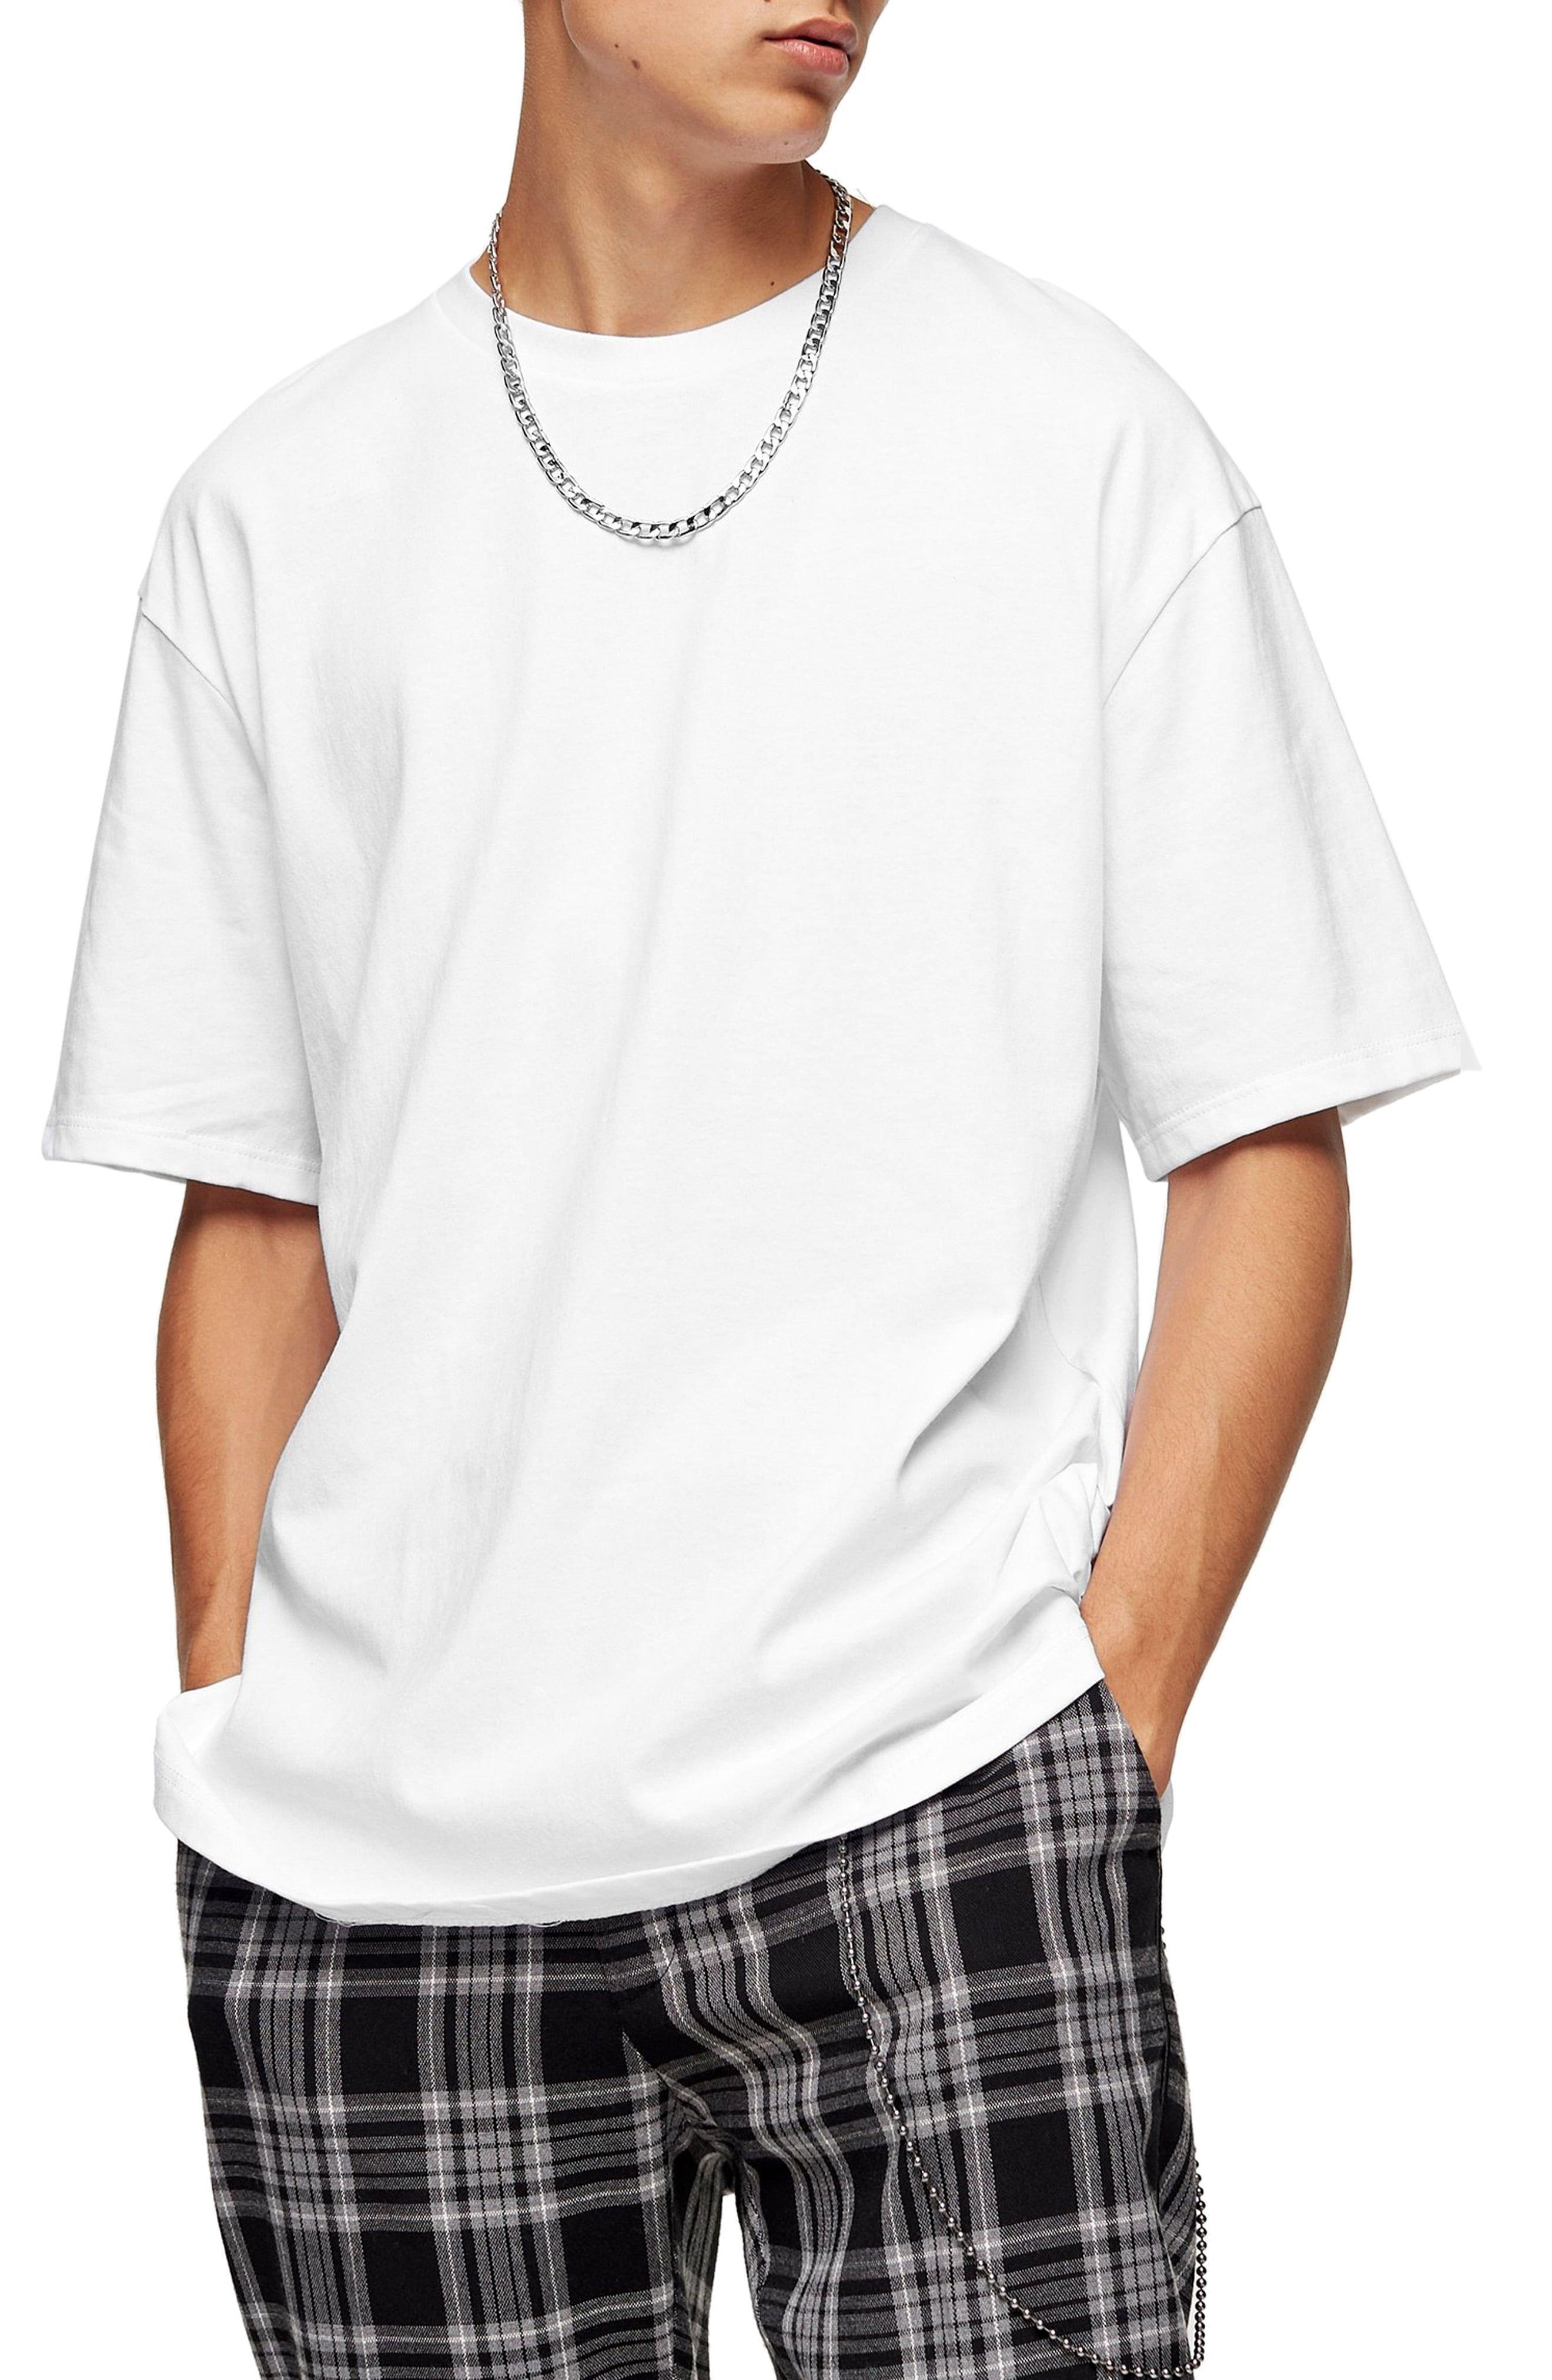 32++ Oversized t shirt mens ideas ideas